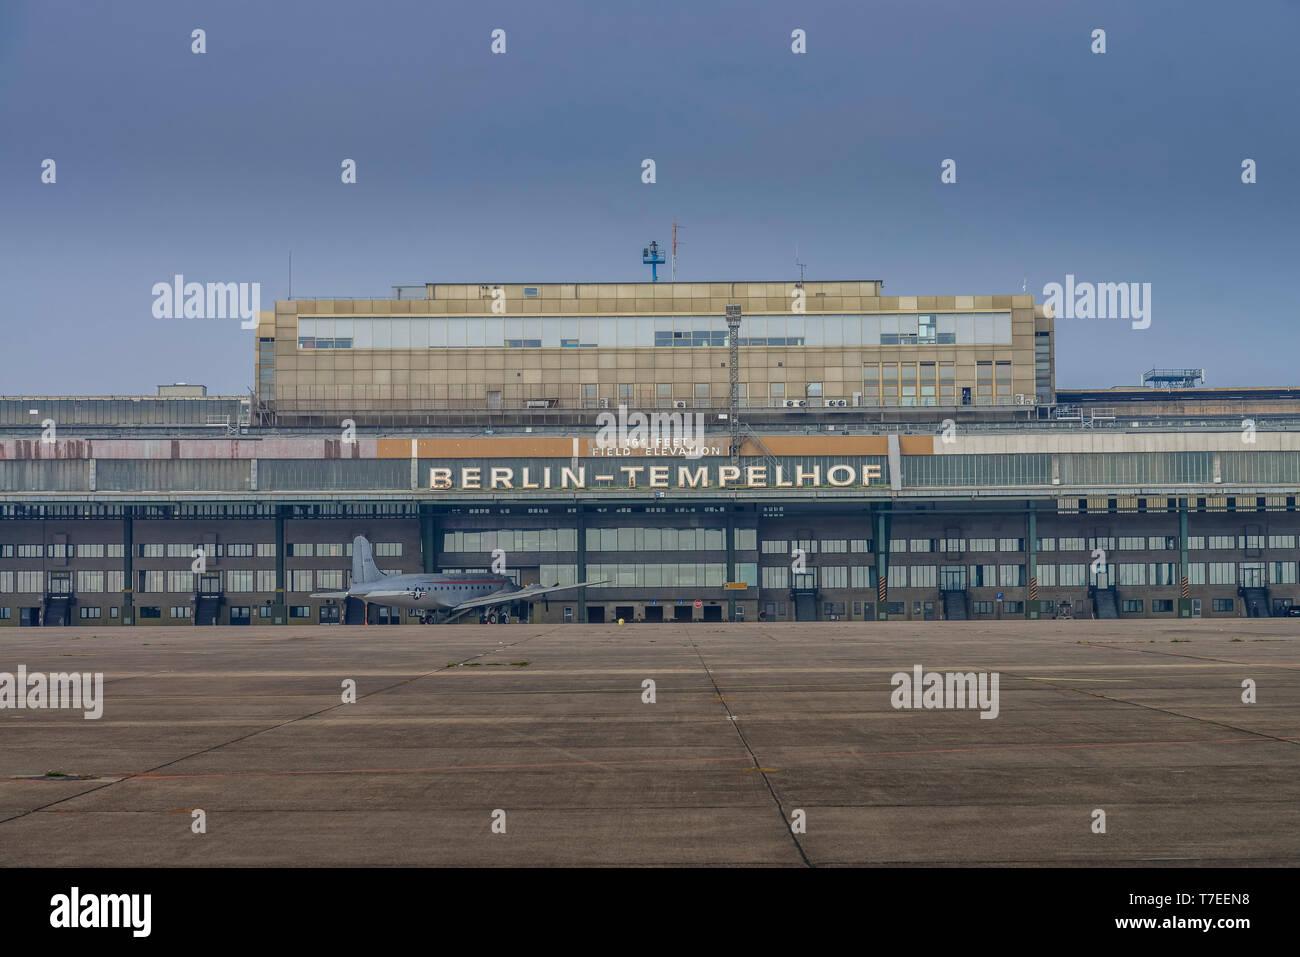 Hangar, Flughafen Tempelhof, Berlin, Deutschland - Stock Image